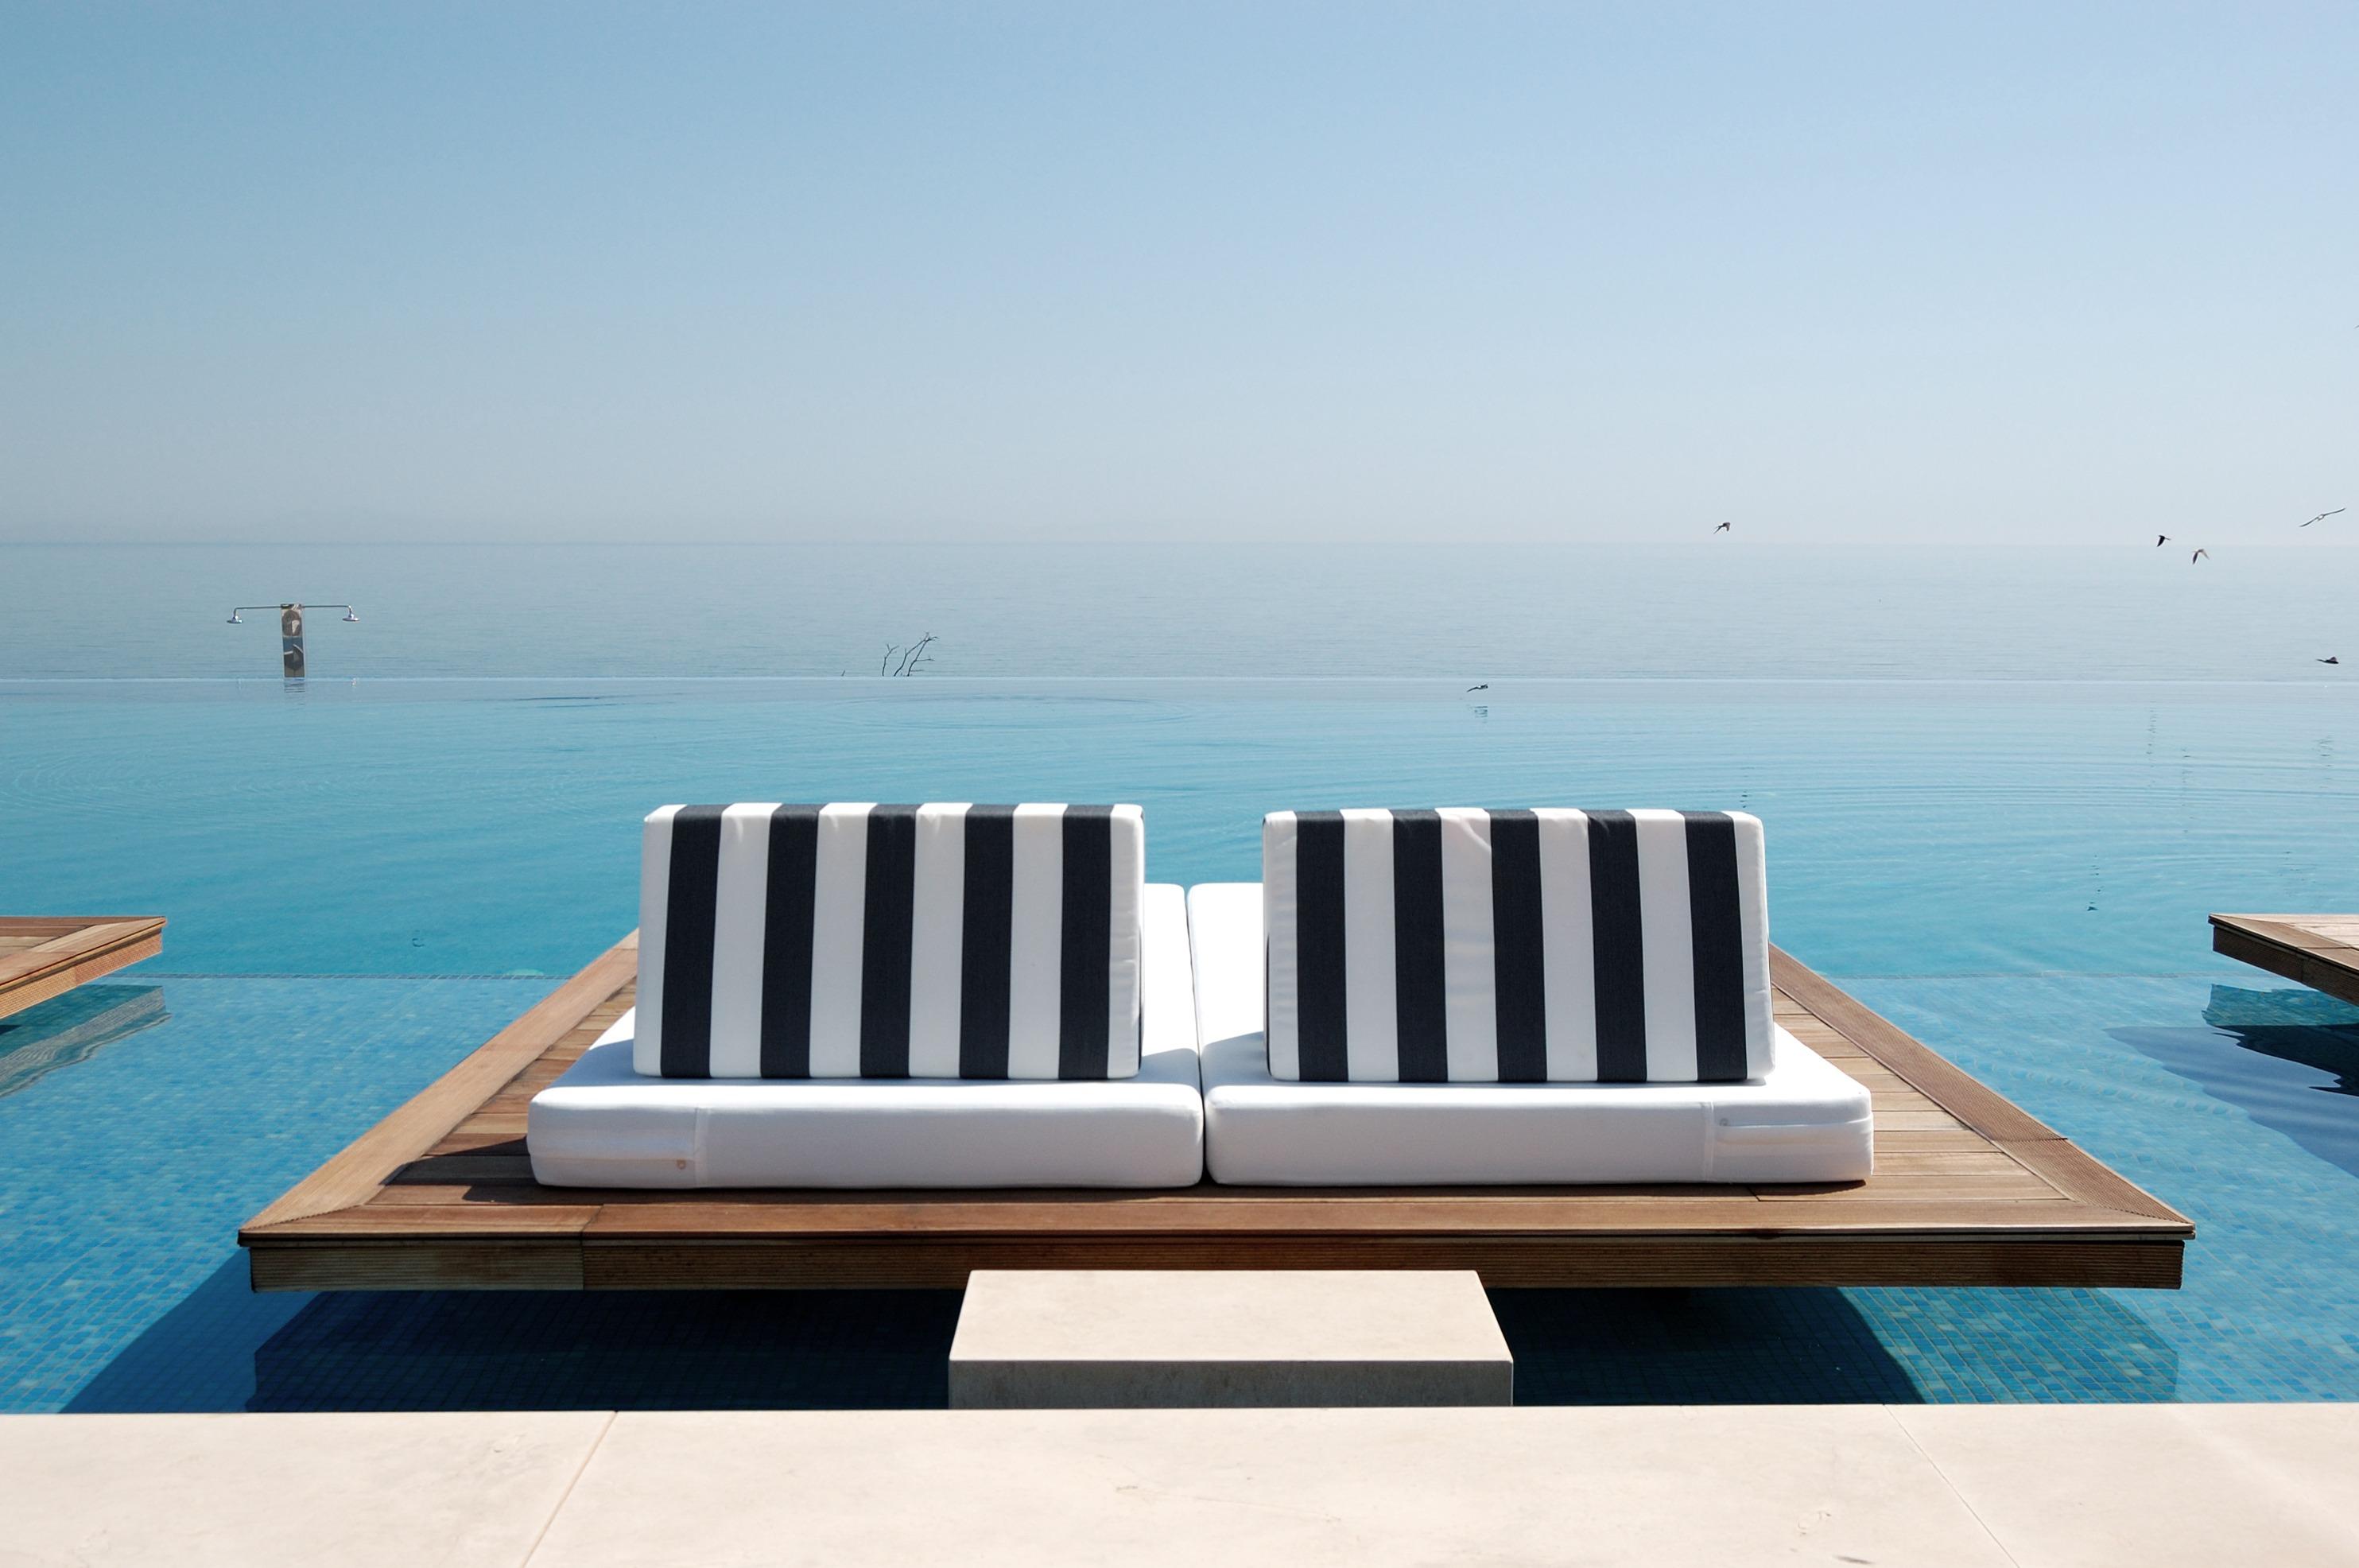 vacances les destinations pr f r es des fran ais franfinance. Black Bedroom Furniture Sets. Home Design Ideas